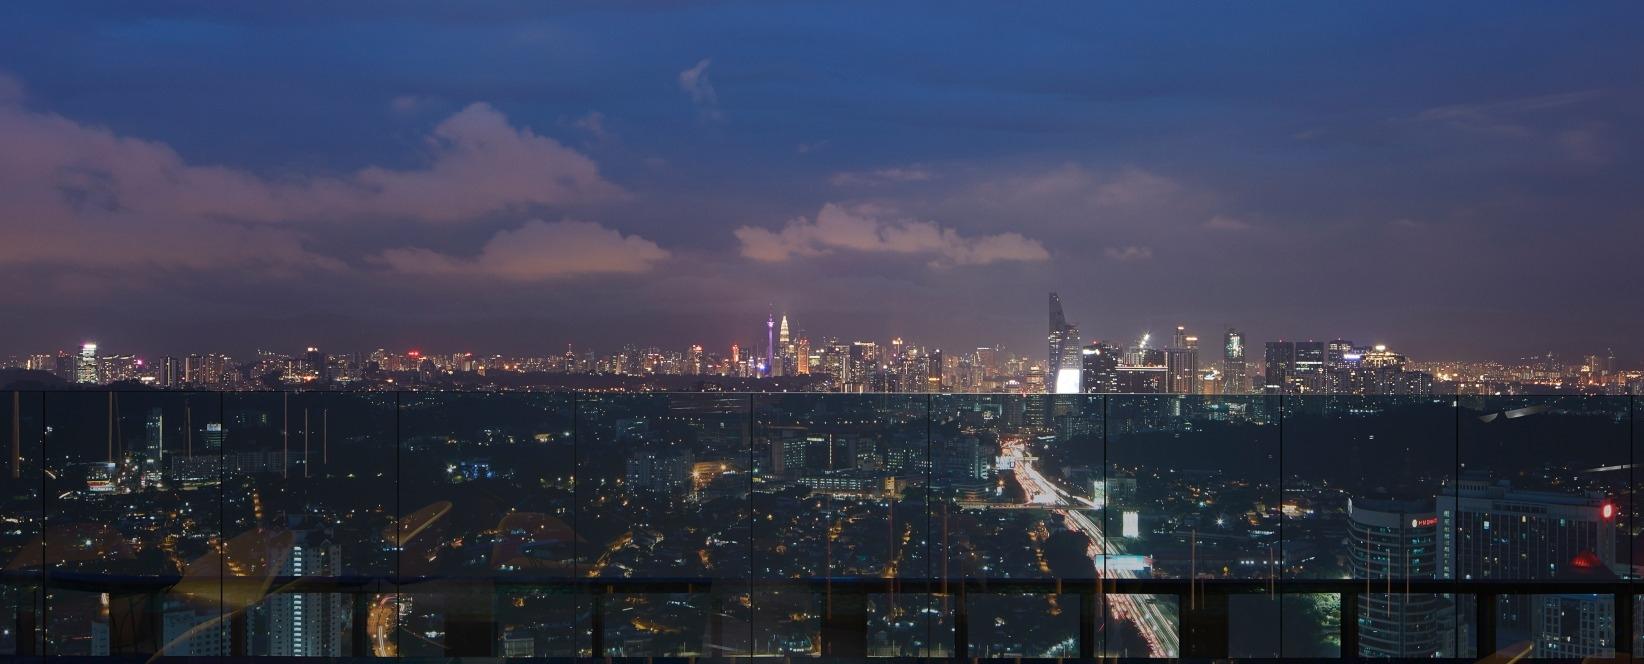 #BAZAARPicks: 6 Places to Be on NYE in Kuala Lumpur